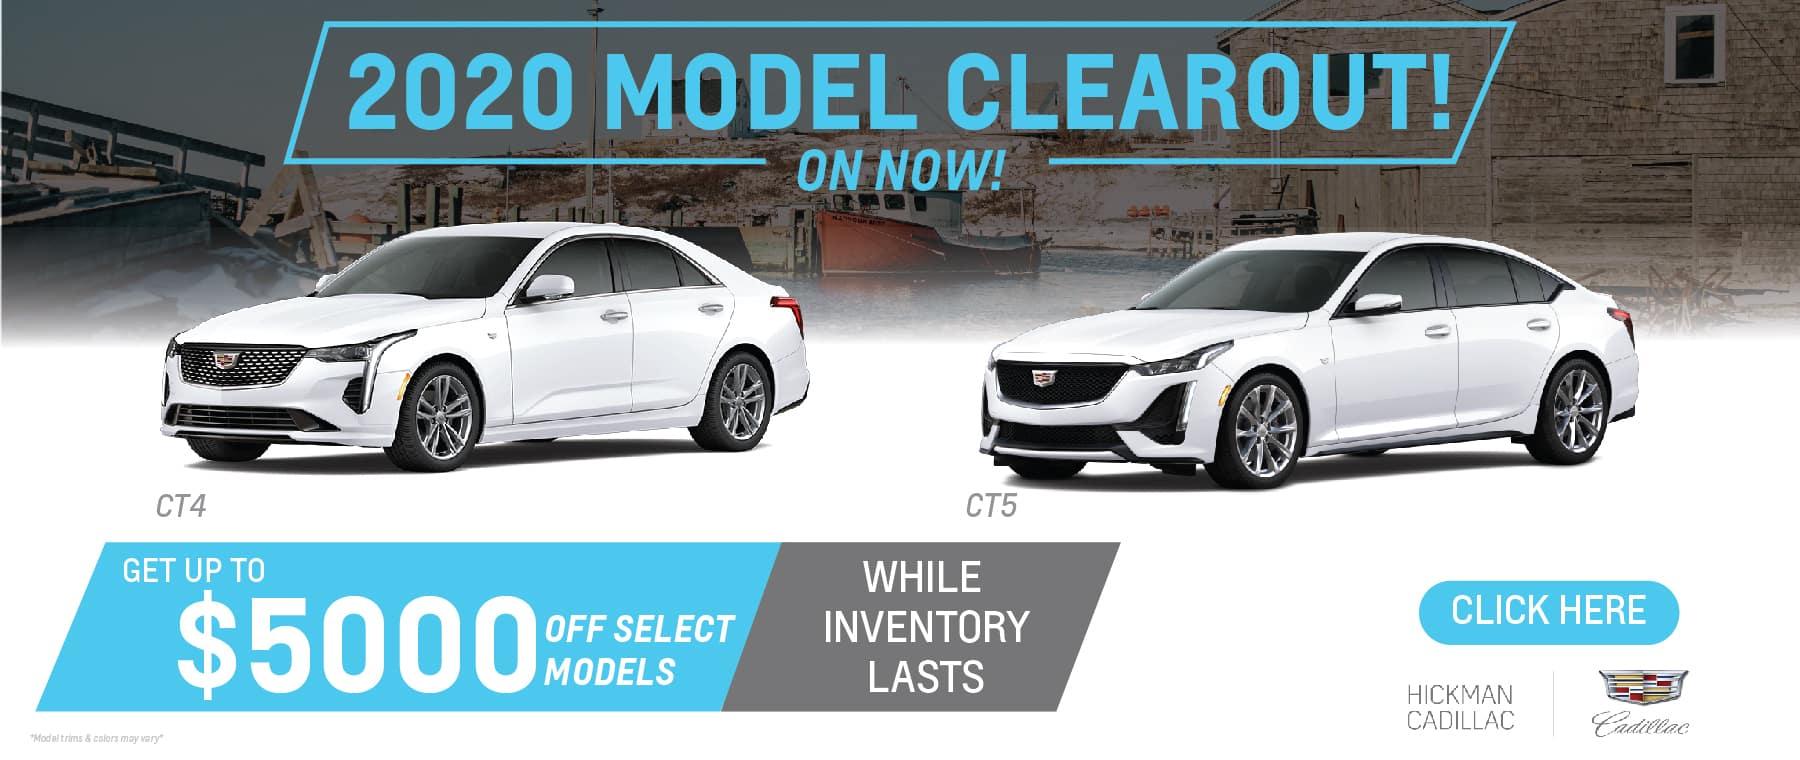 2020 Model Clear Out – Cadillac – Web Desktop-01